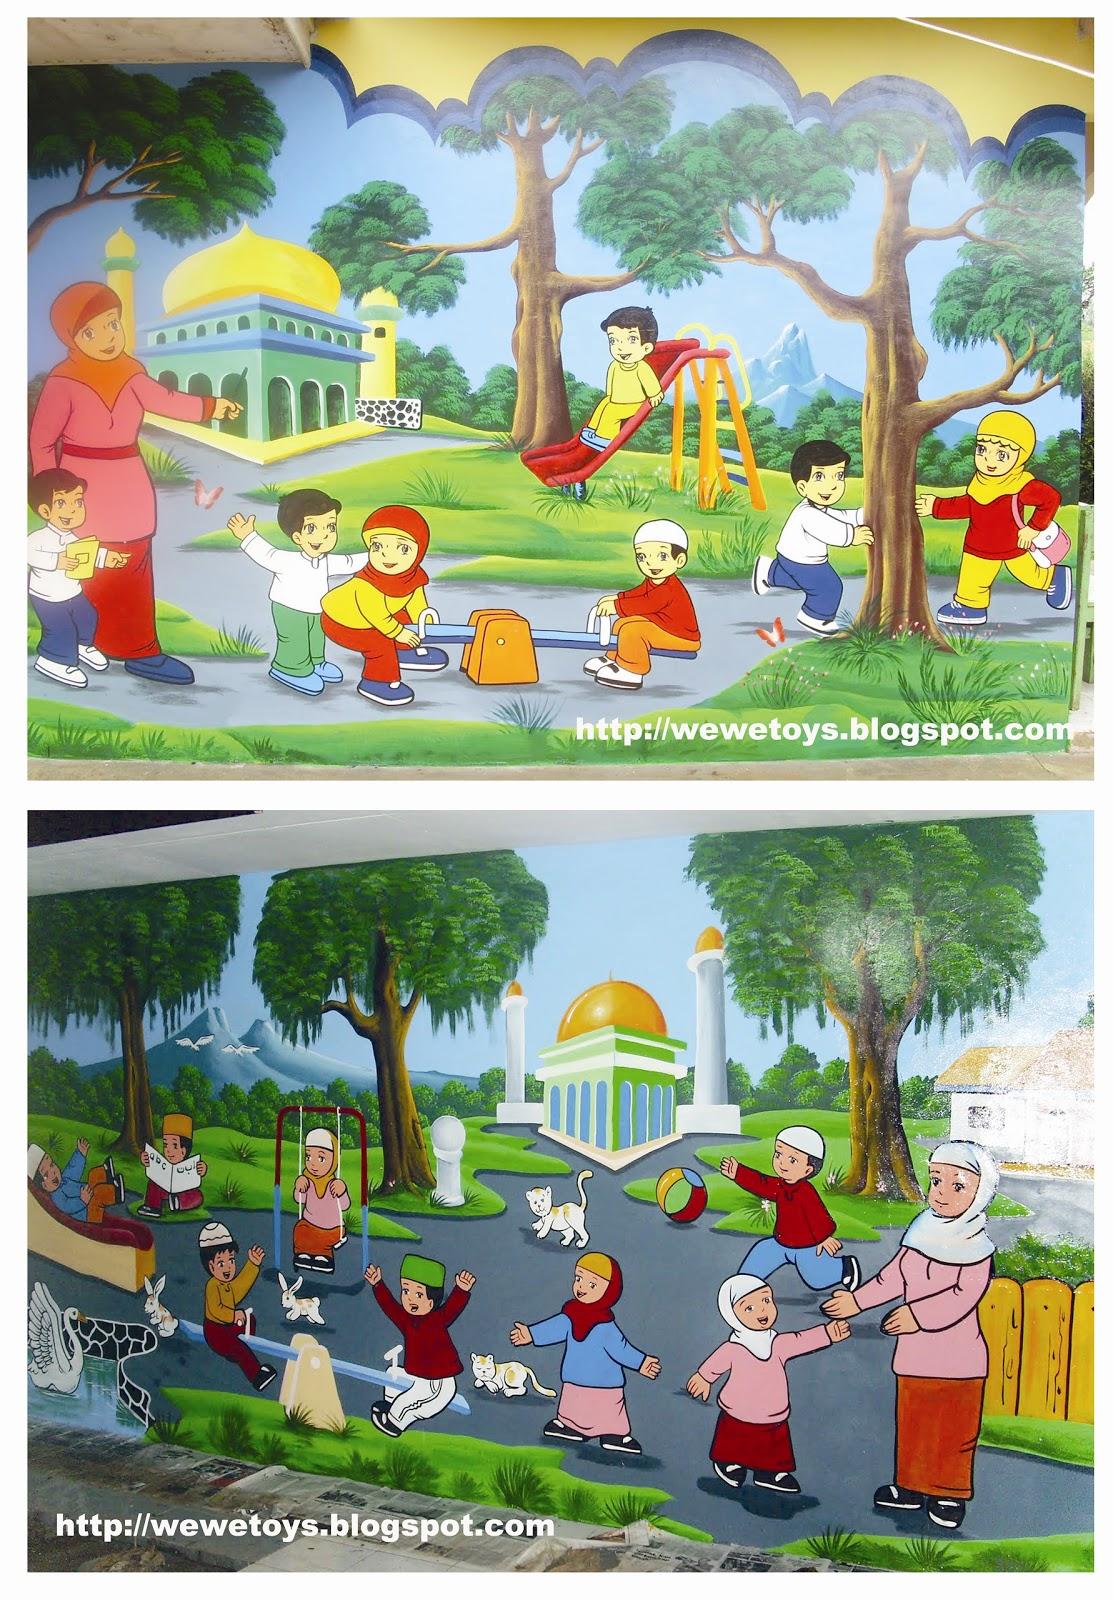 Contoh Gambar Ilustrasi Tentang Lingkungan Sekolah Iluszi